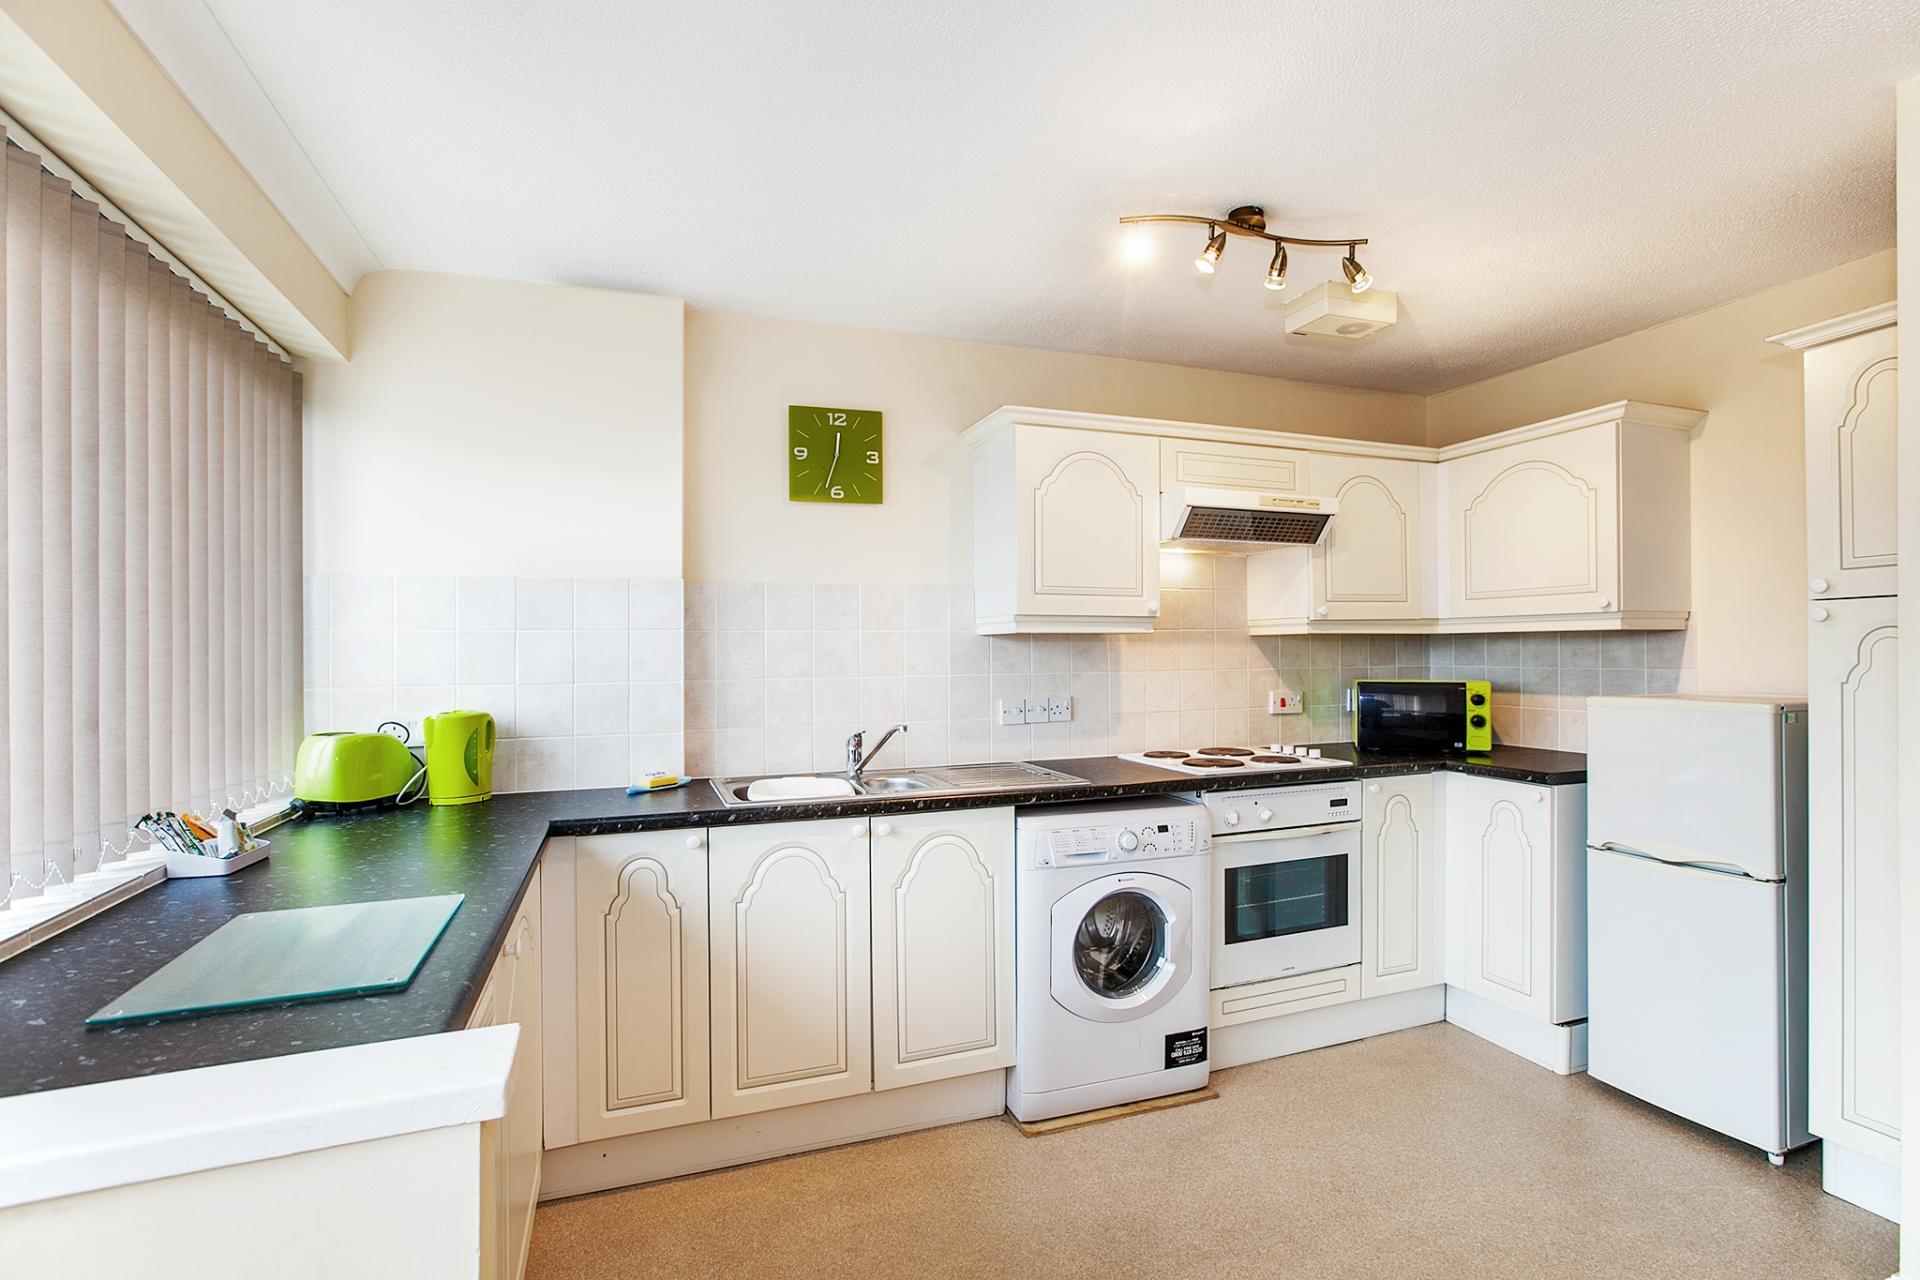 Kitchen at South Row Apartments - Citybase Apartments